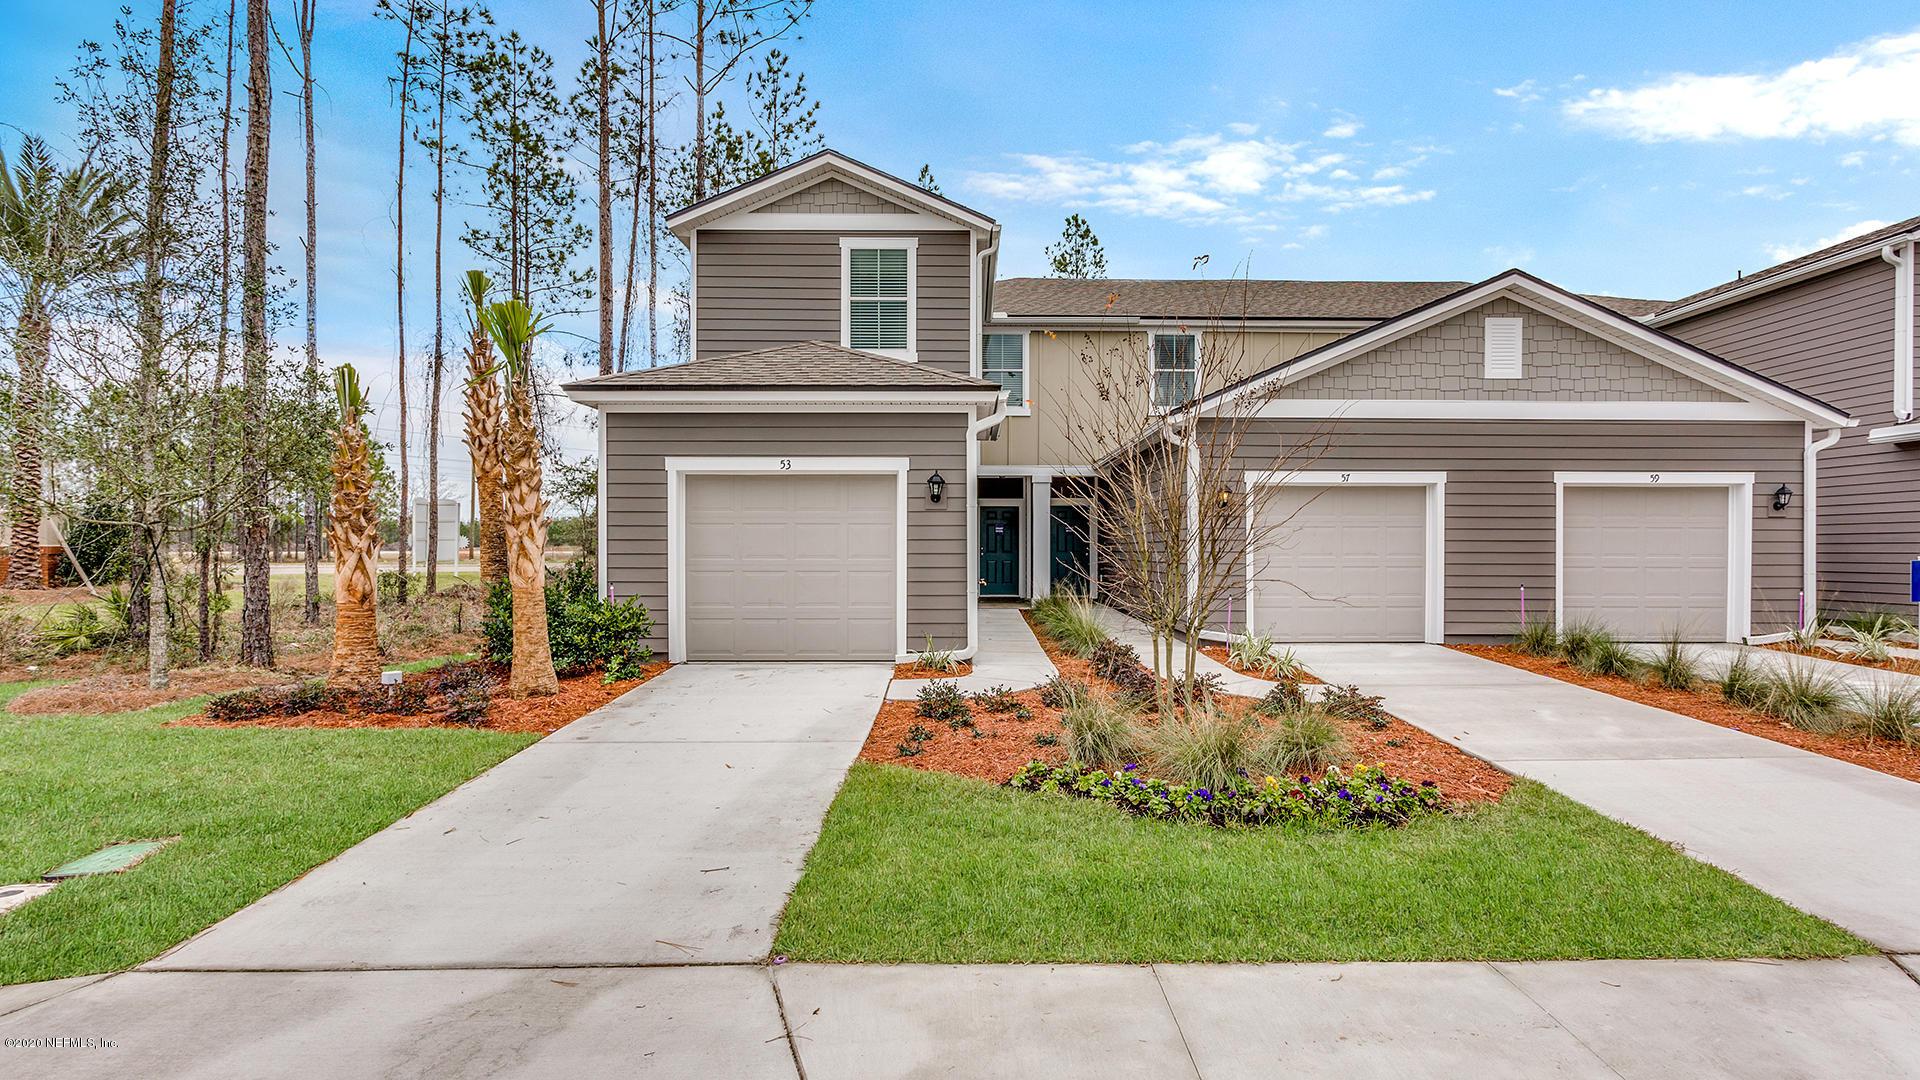 266 ARALIA, JACKSONVILLE, FLORIDA 32216, 2 Bedrooms Bedrooms, ,2 BathroomsBathrooms,Residential,For sale,ARALIA,1059806